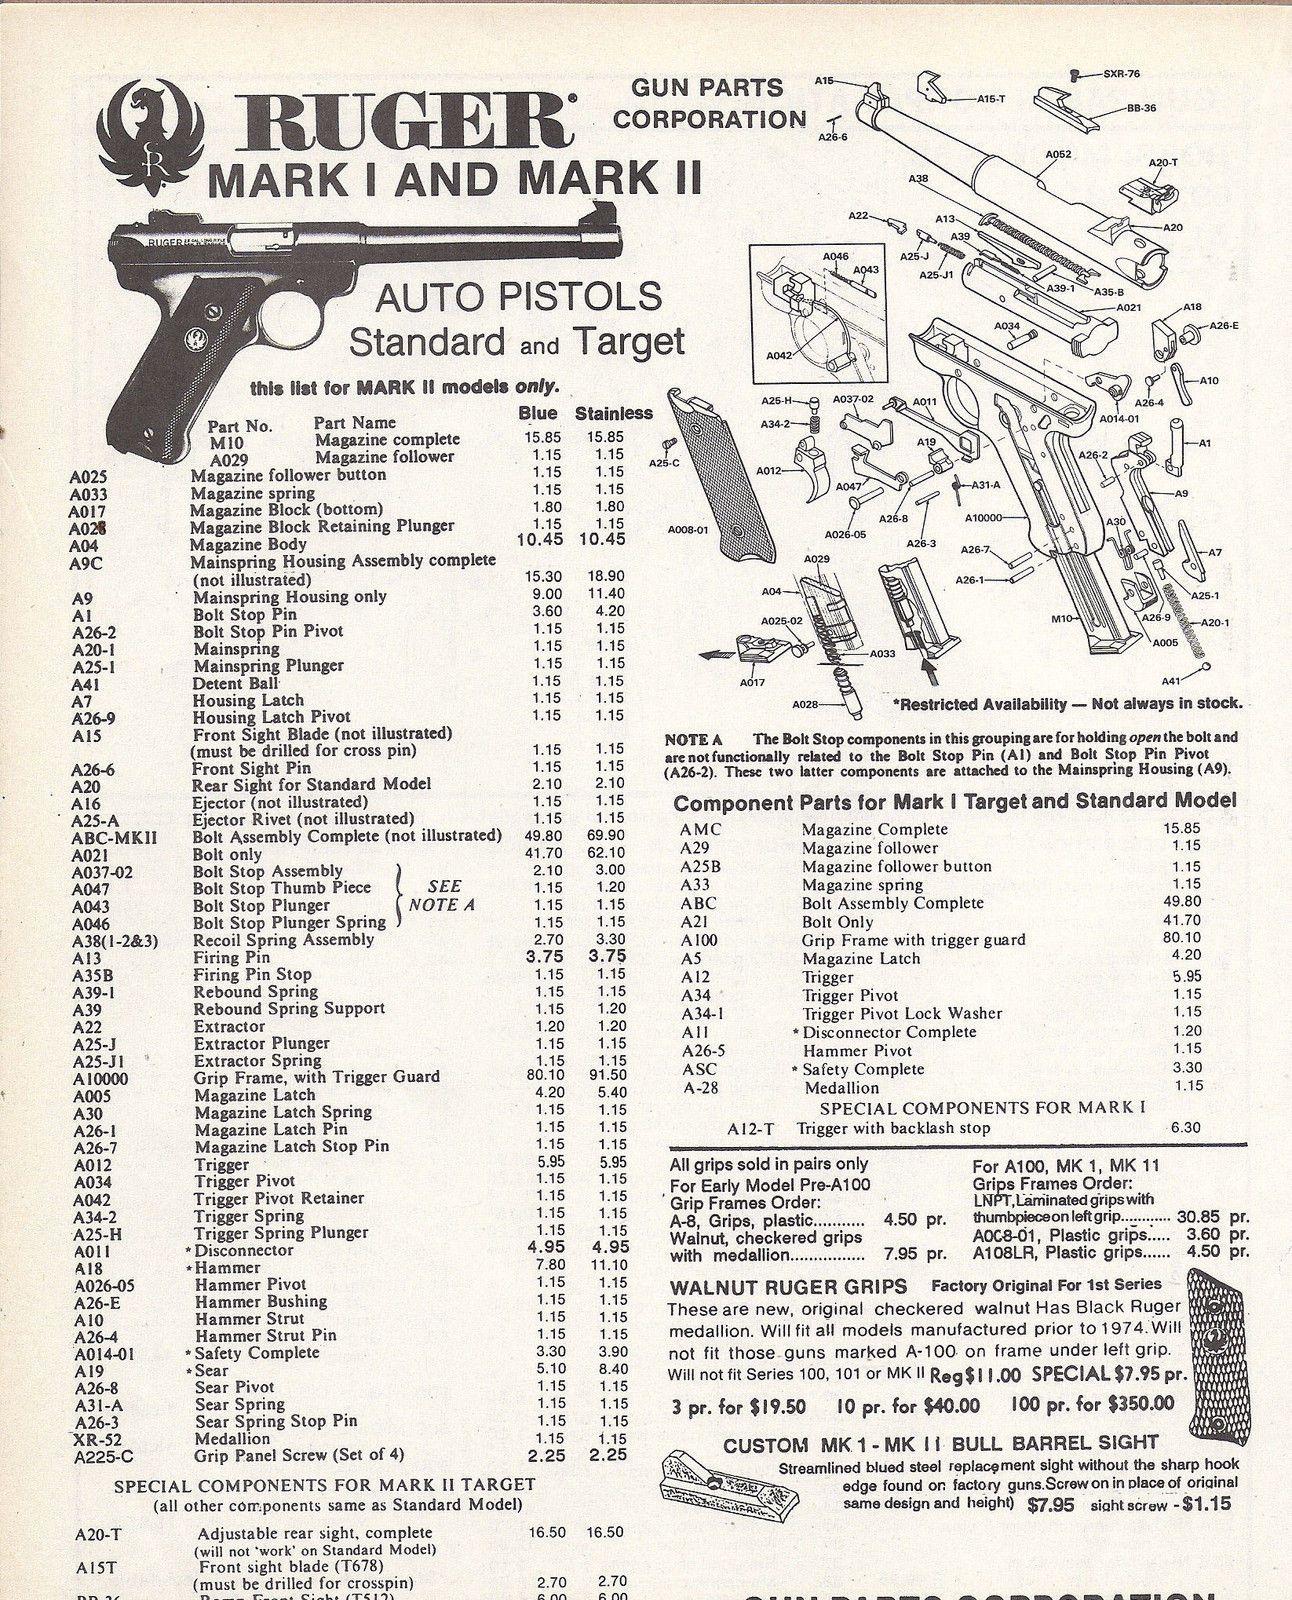 1995 Sturm Ruger Mark I Mark II Auto Pistol Revolver